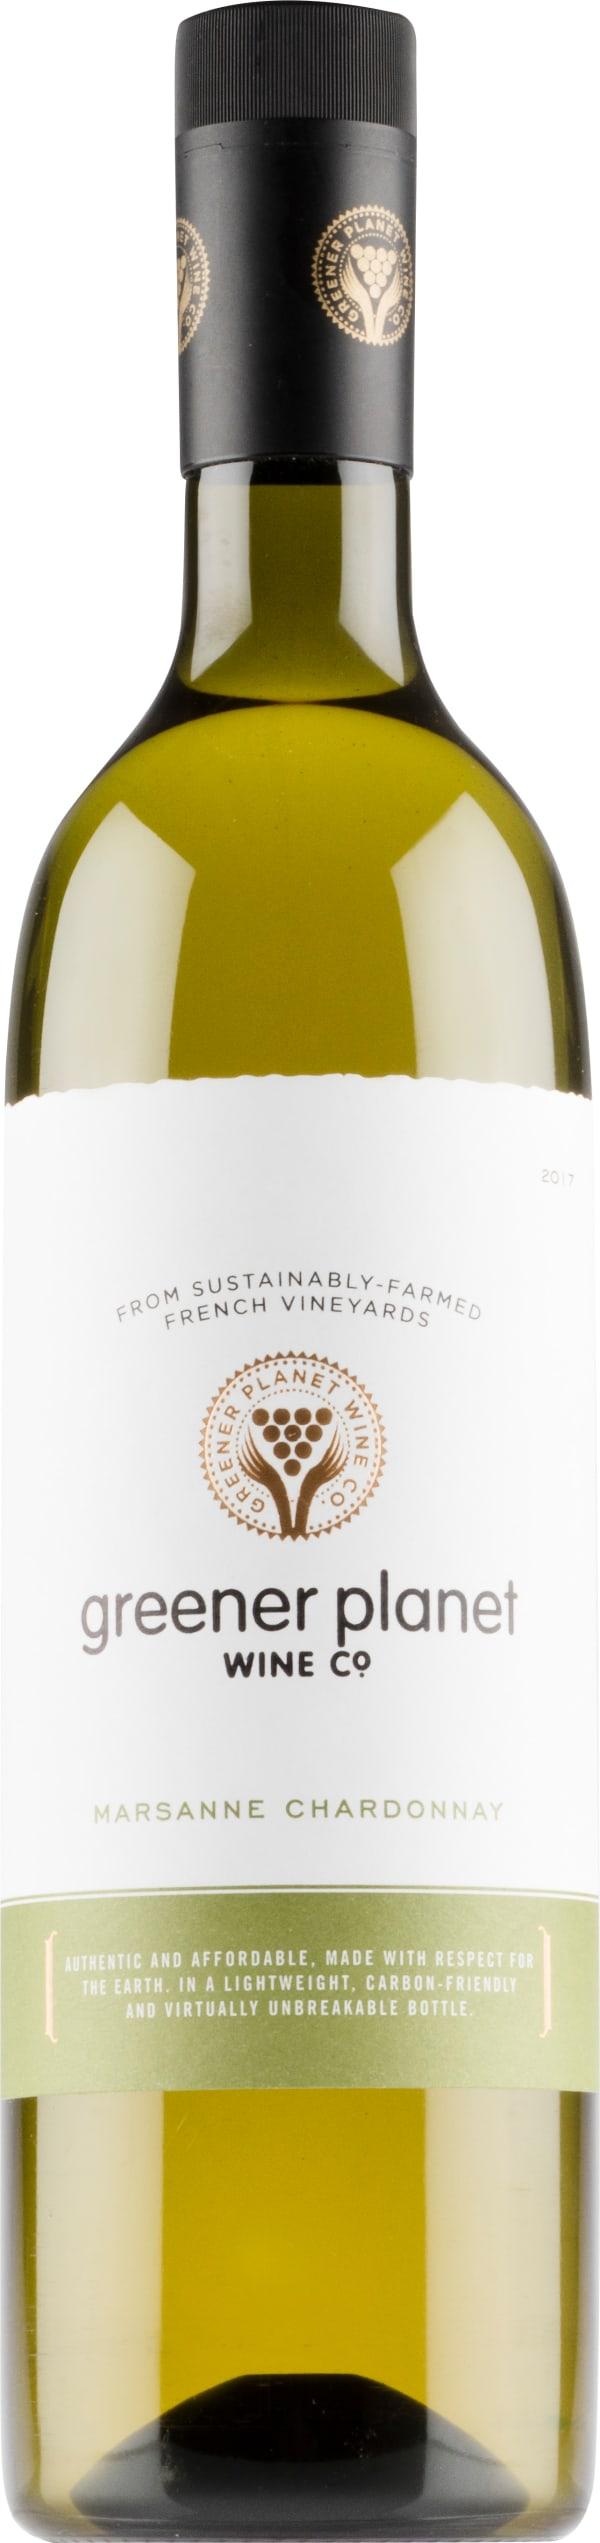 Greener Planet Marsanne Chardonnay 2018 plastflaska